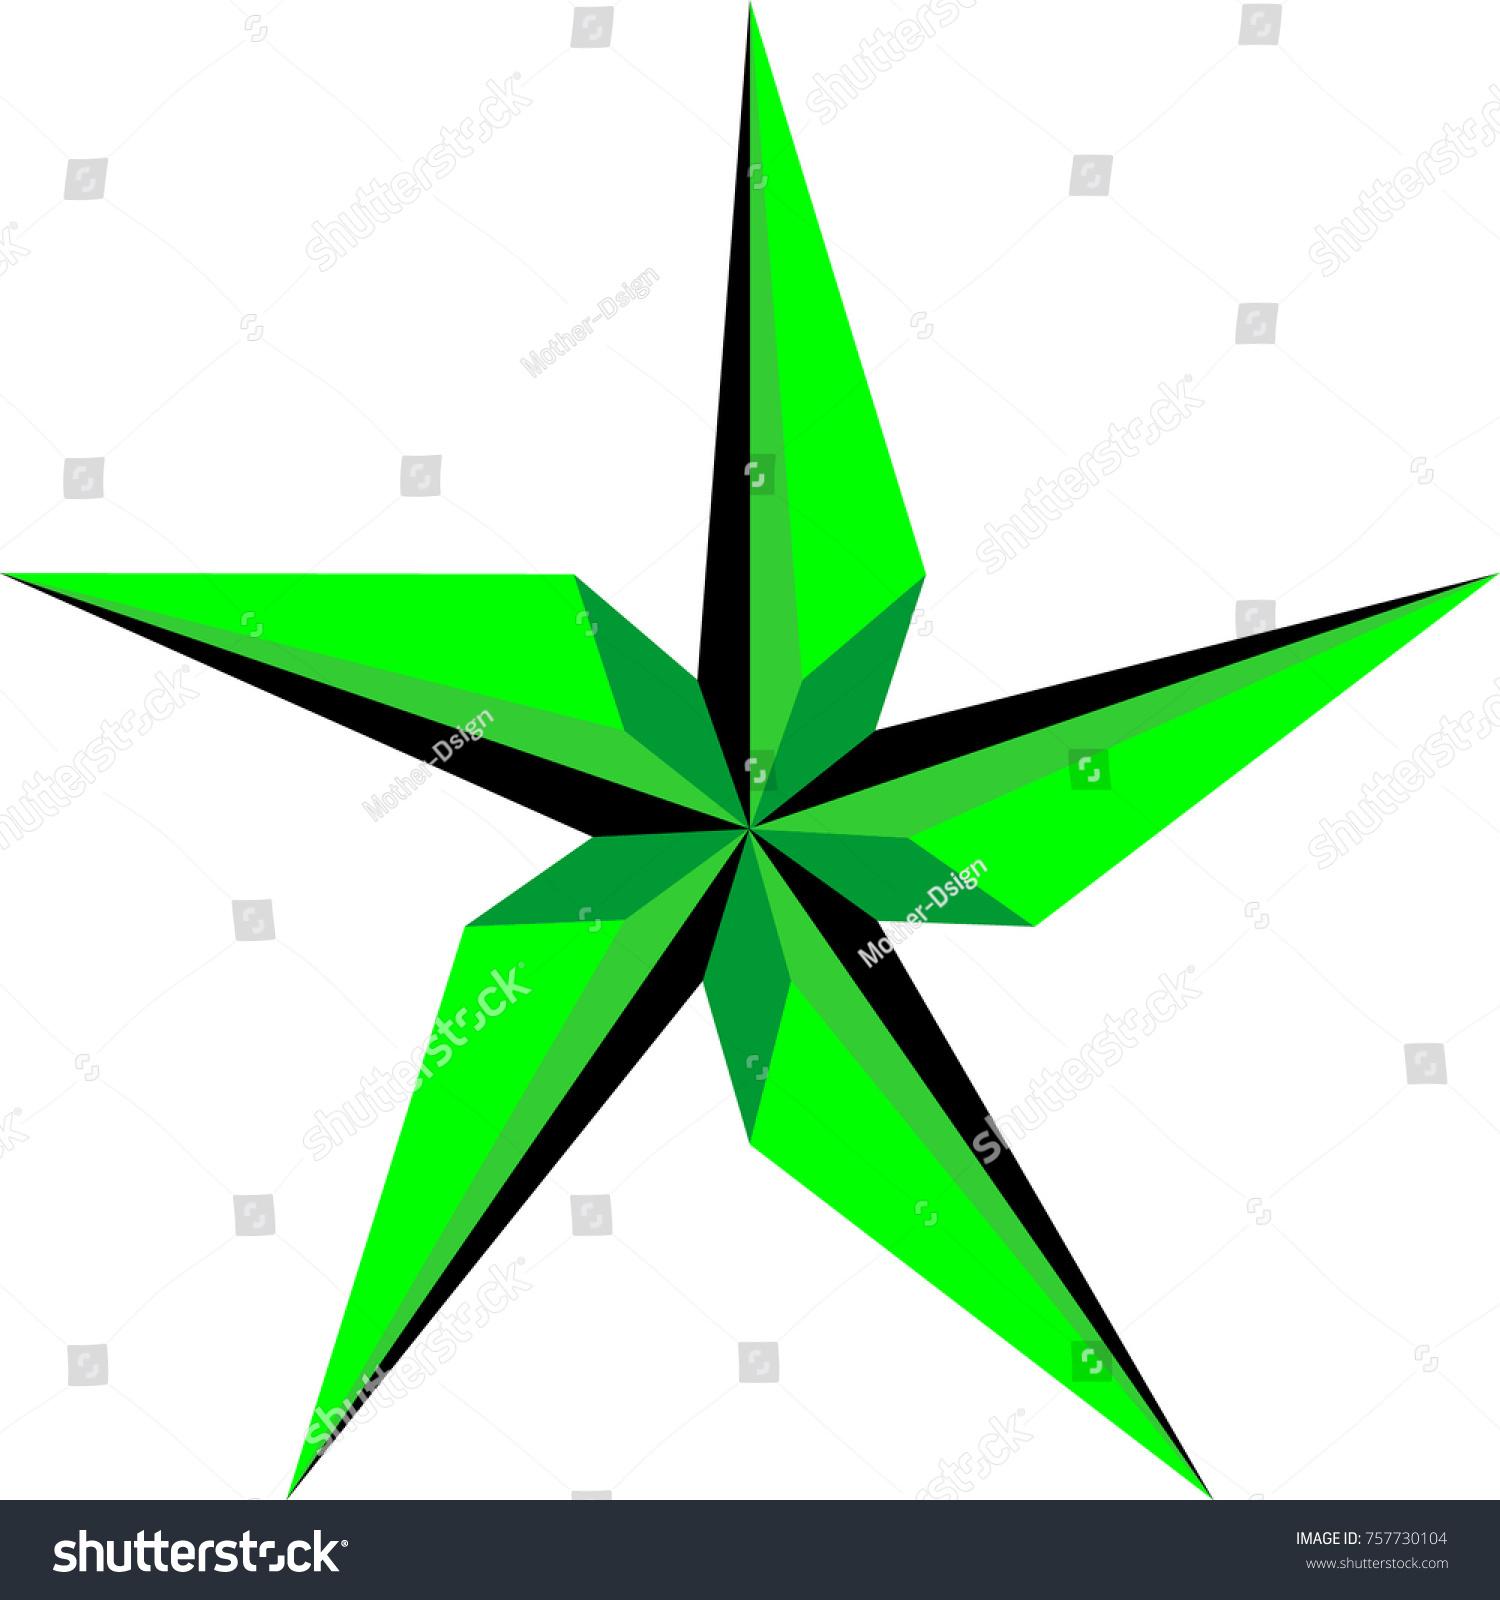 green star design illustration stock vector 757730104 shutterstock rh shutterstock com Yellow Star Clip Art Orange Star Clip Art